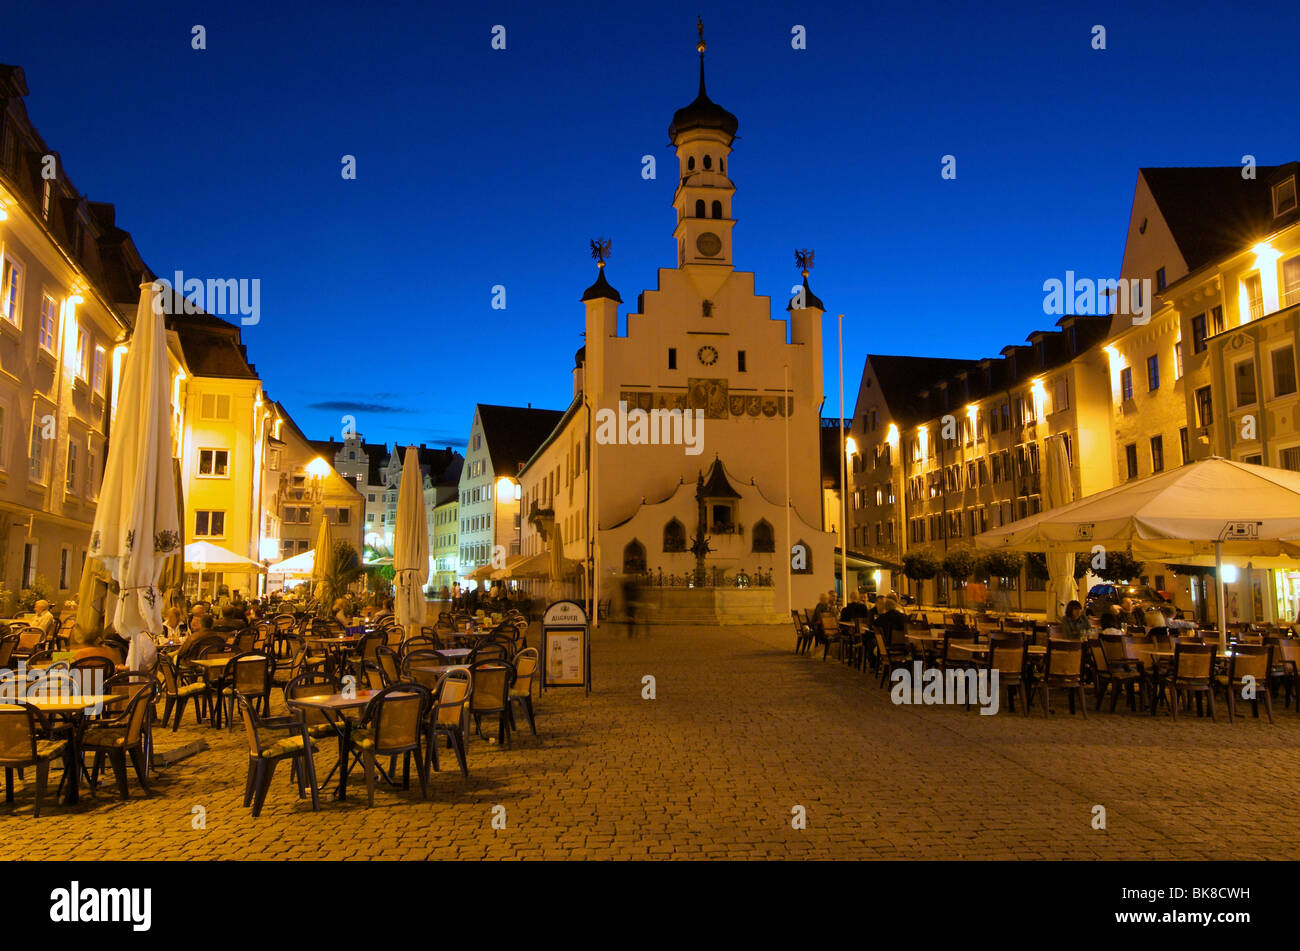 Town Hall square in Kempten, Allgaeu, Bavaria, Germany, Europe Stock Photo